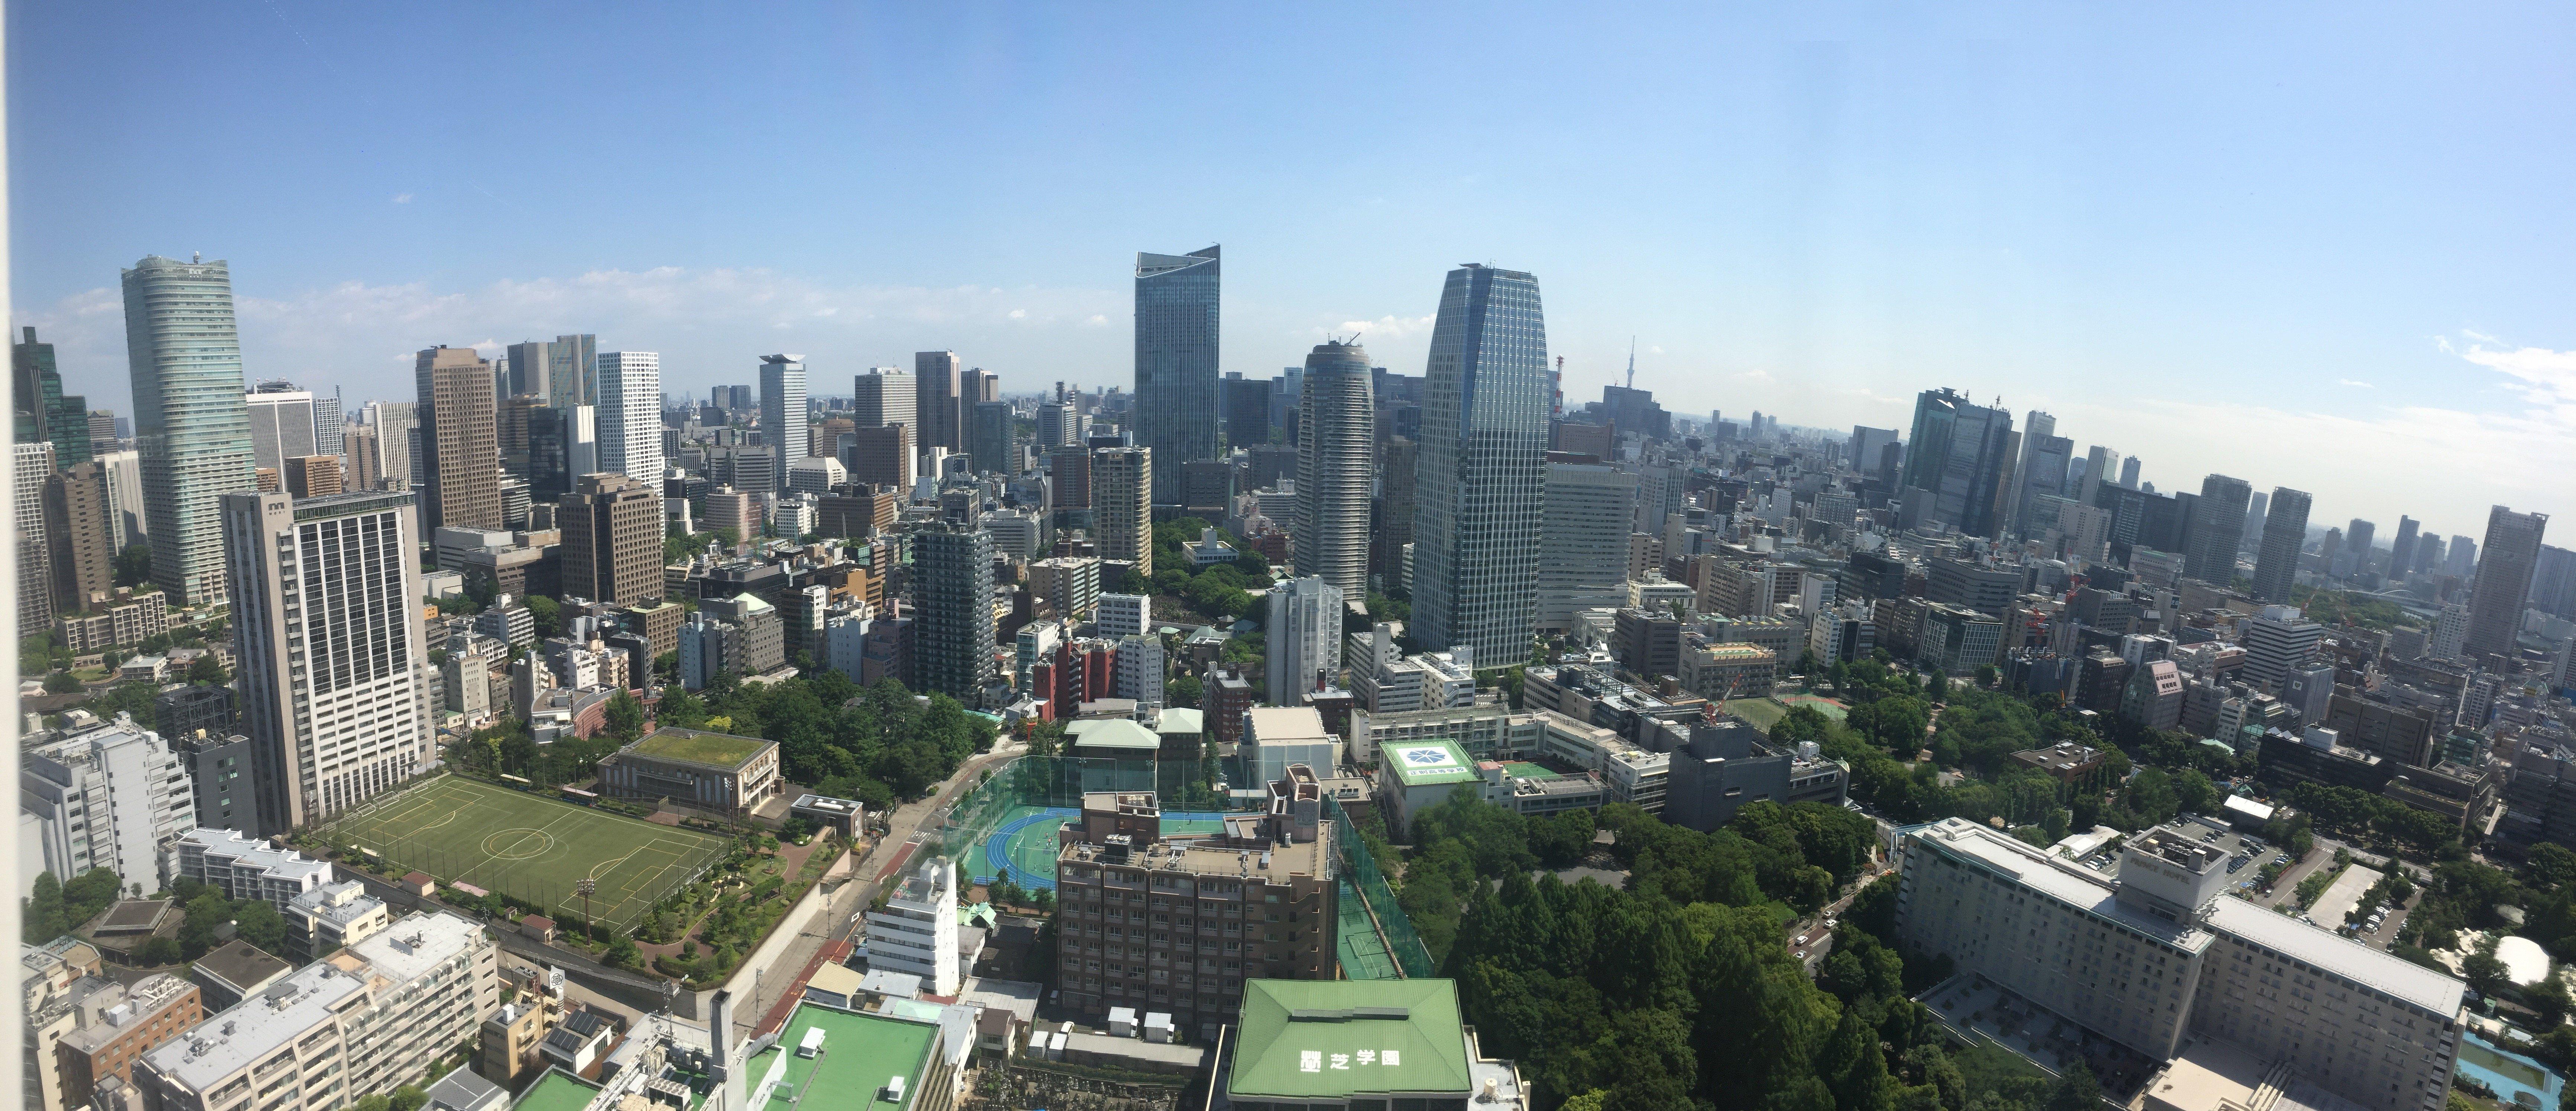 Tokyo a study abroad experience in japan jjc joliet junior college